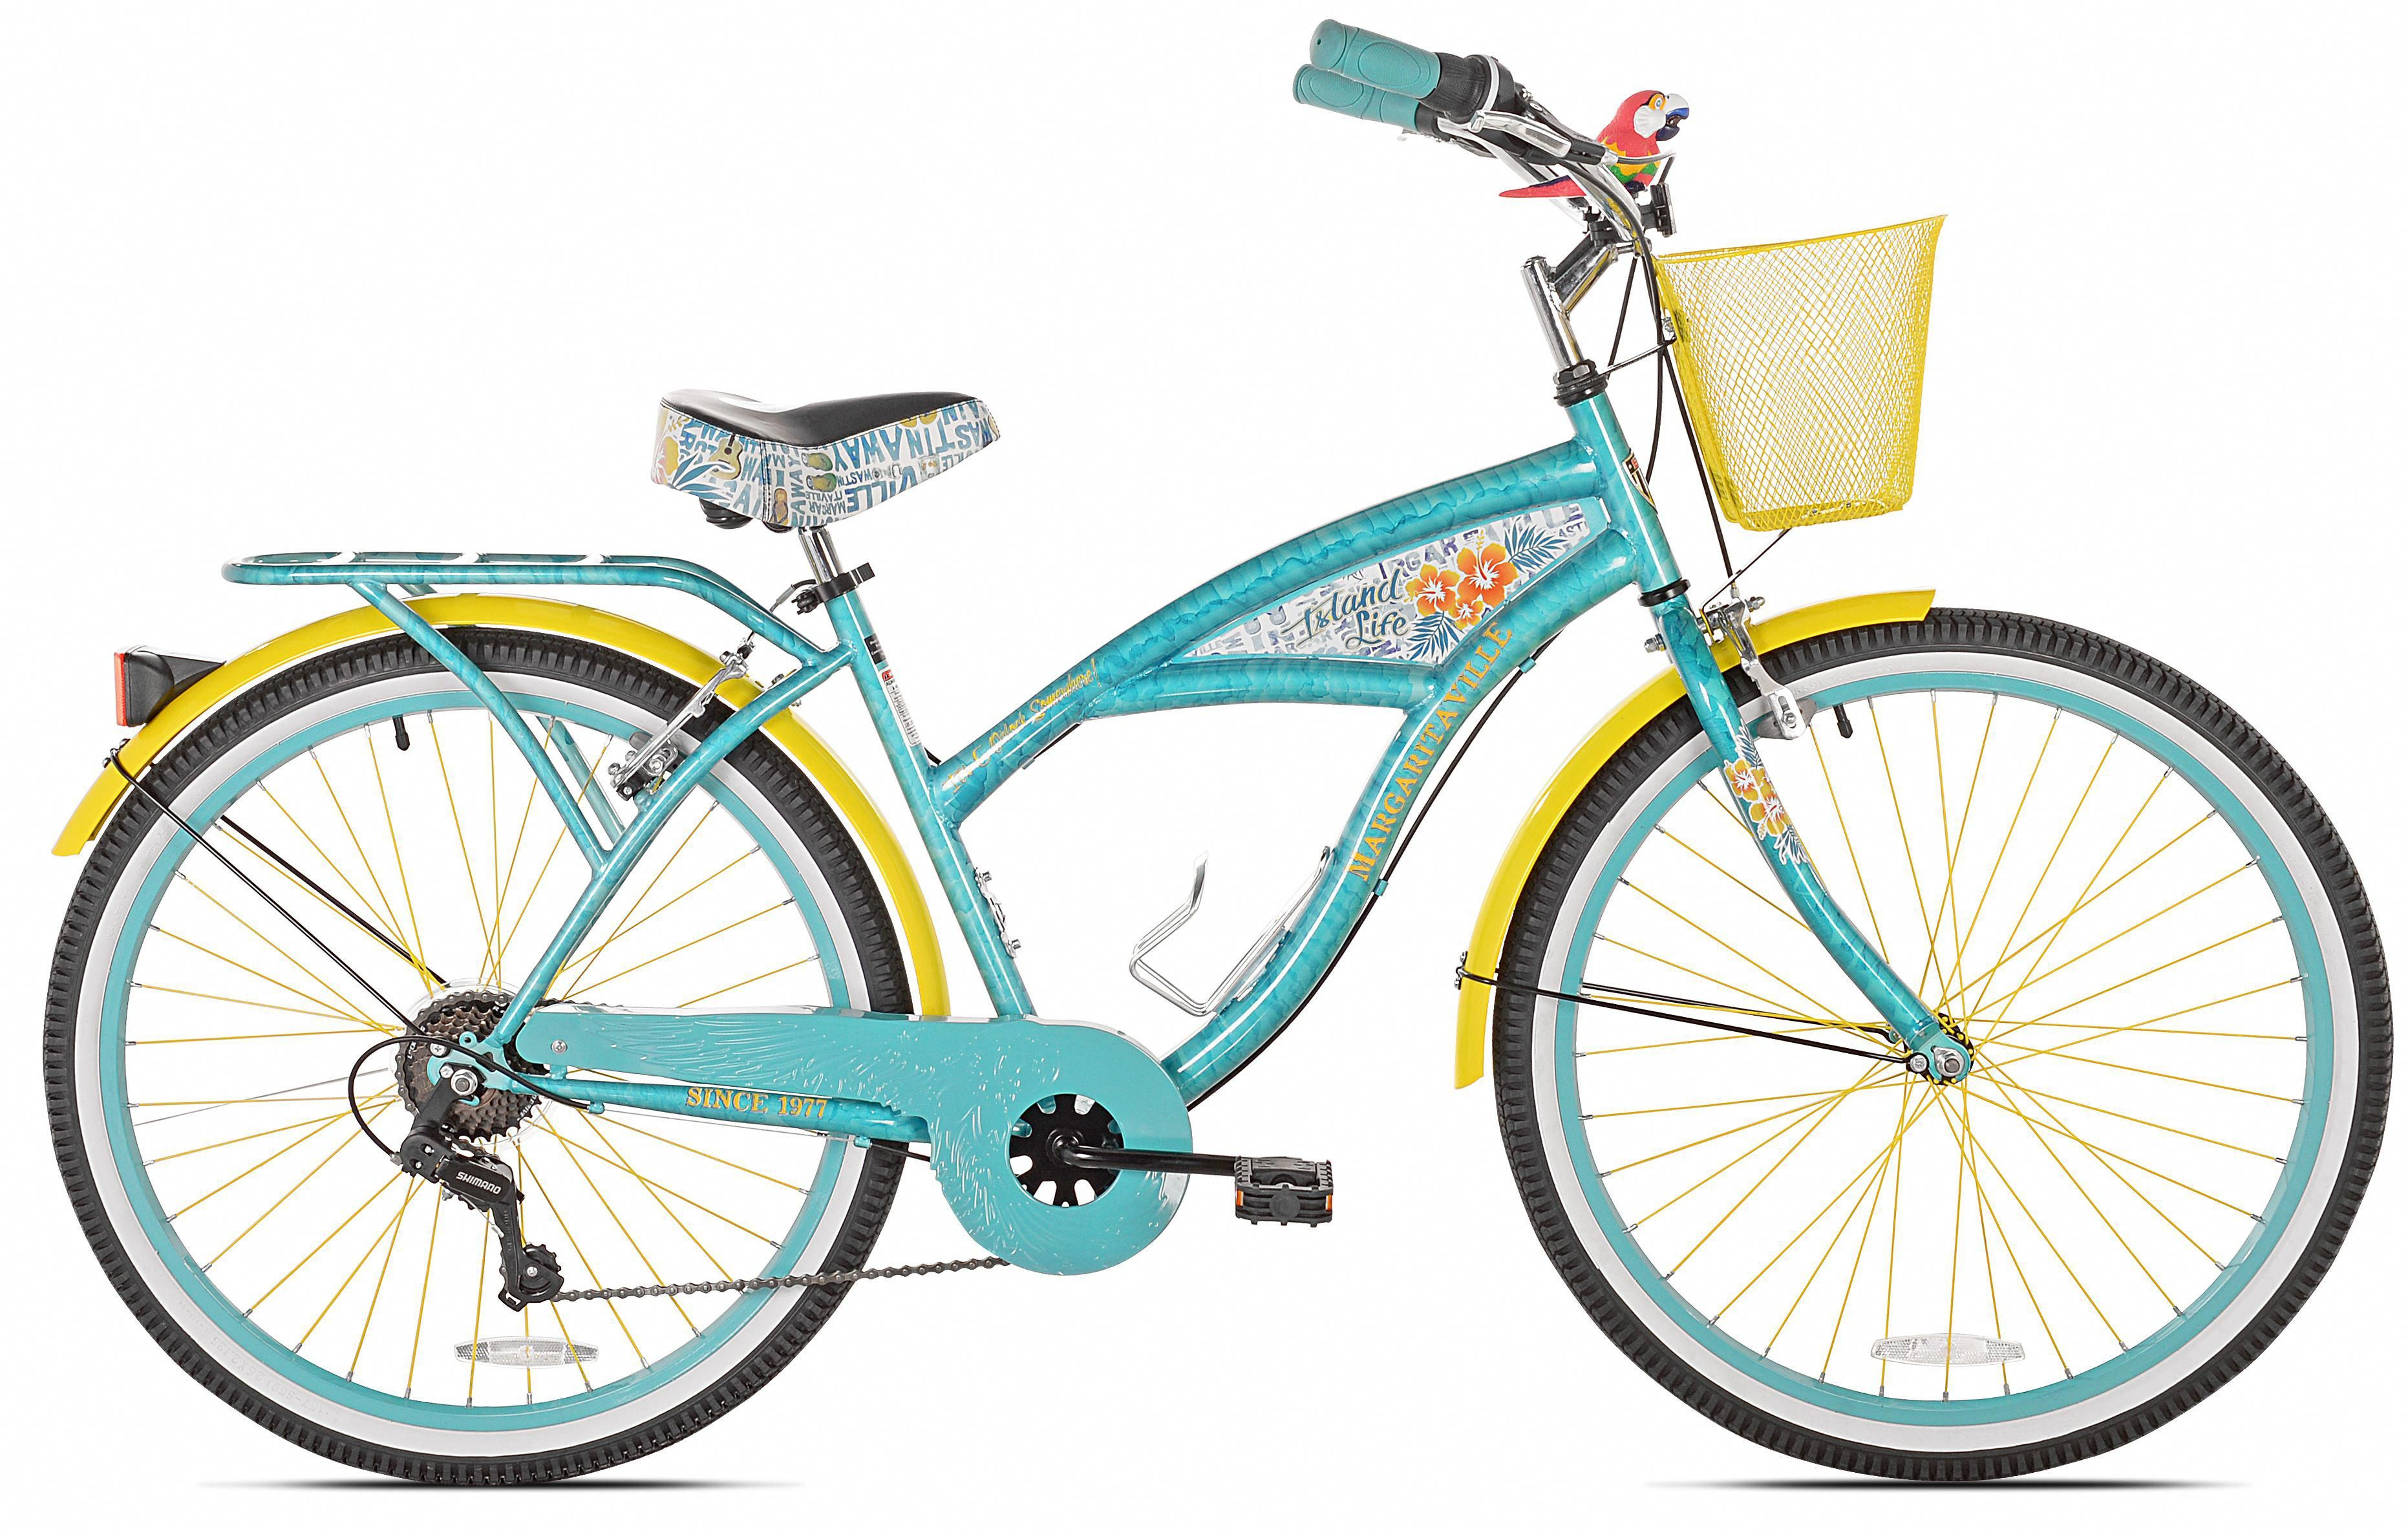 26 Women S Margaritaville Multi Speed Cruiser Bike Walmart Com 149 Coolbikeaccessories Roadbikeaccessories Bestr In 2020 Cruiser Bike Margaritaville Bike Bicycle